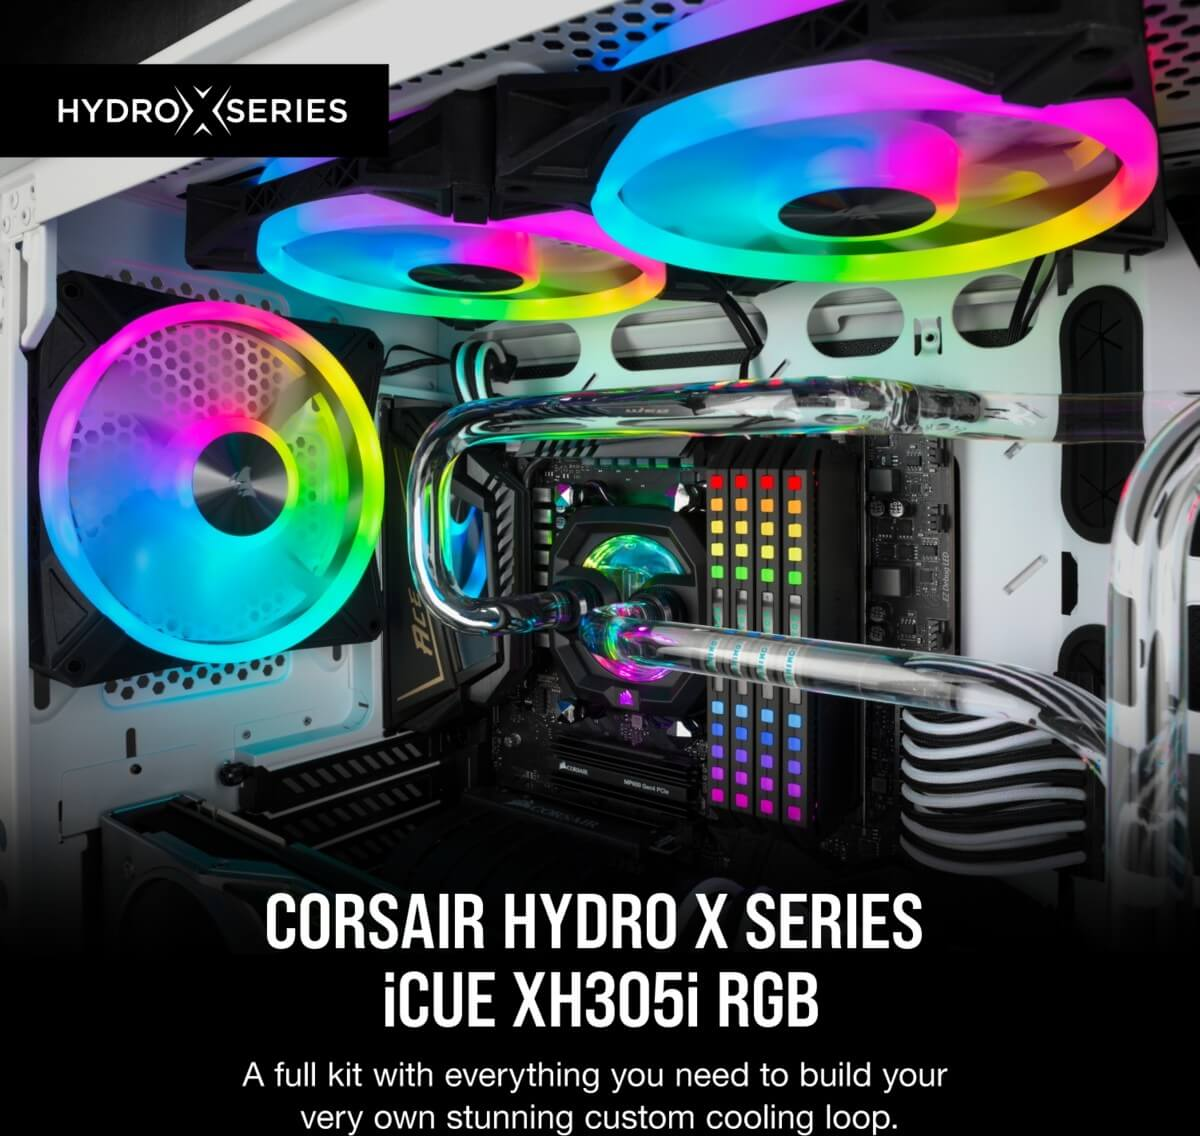 Corsair Hydro X Series iCUE XH305i RGB Custom Cooling Kit-image